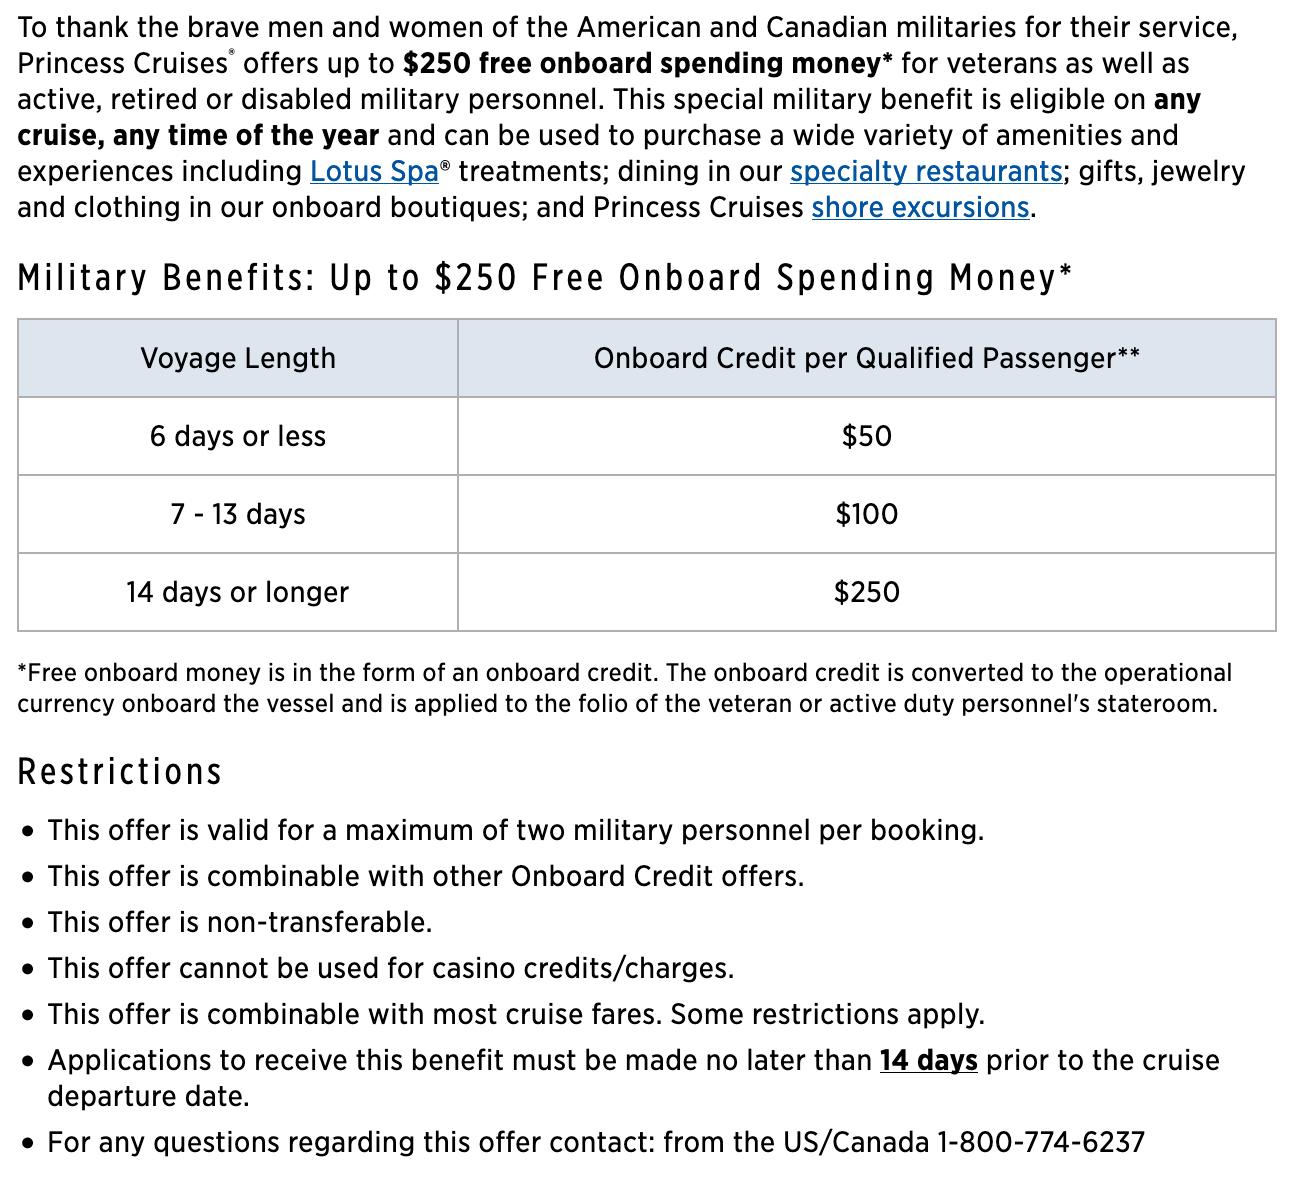 Princess Cruises Military Veteran Discounts